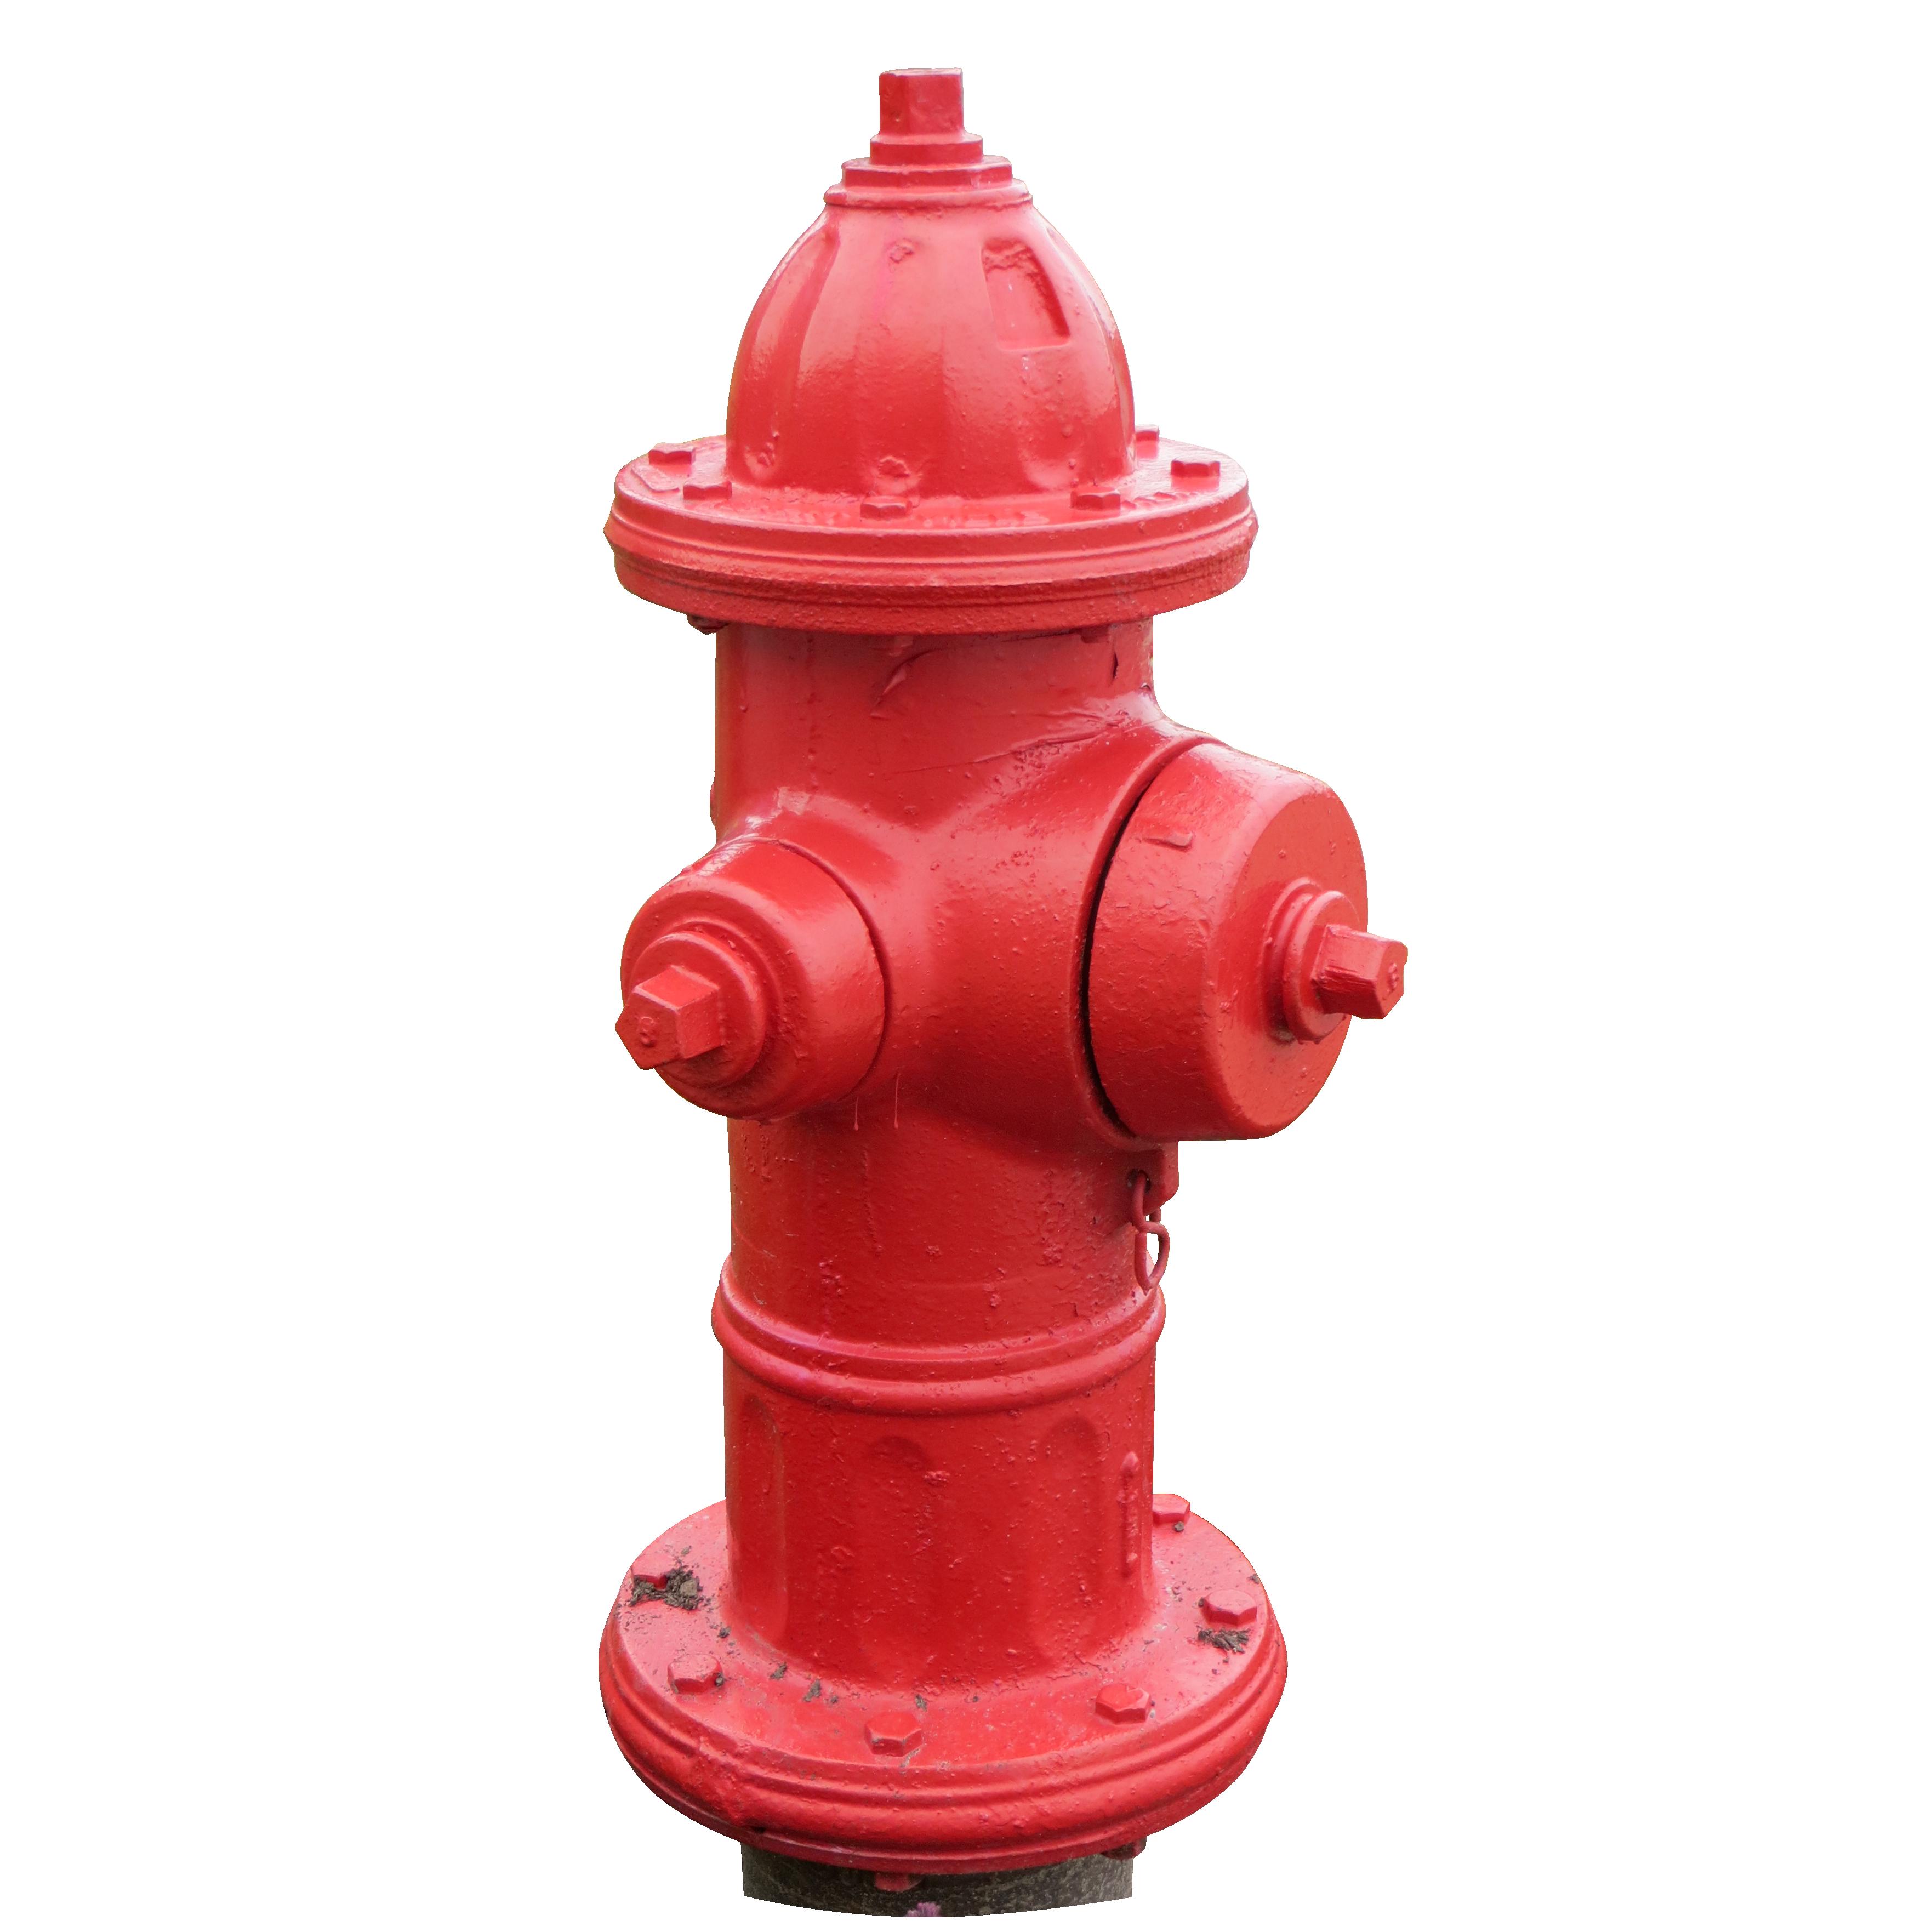 fire hydrant png pngimg com